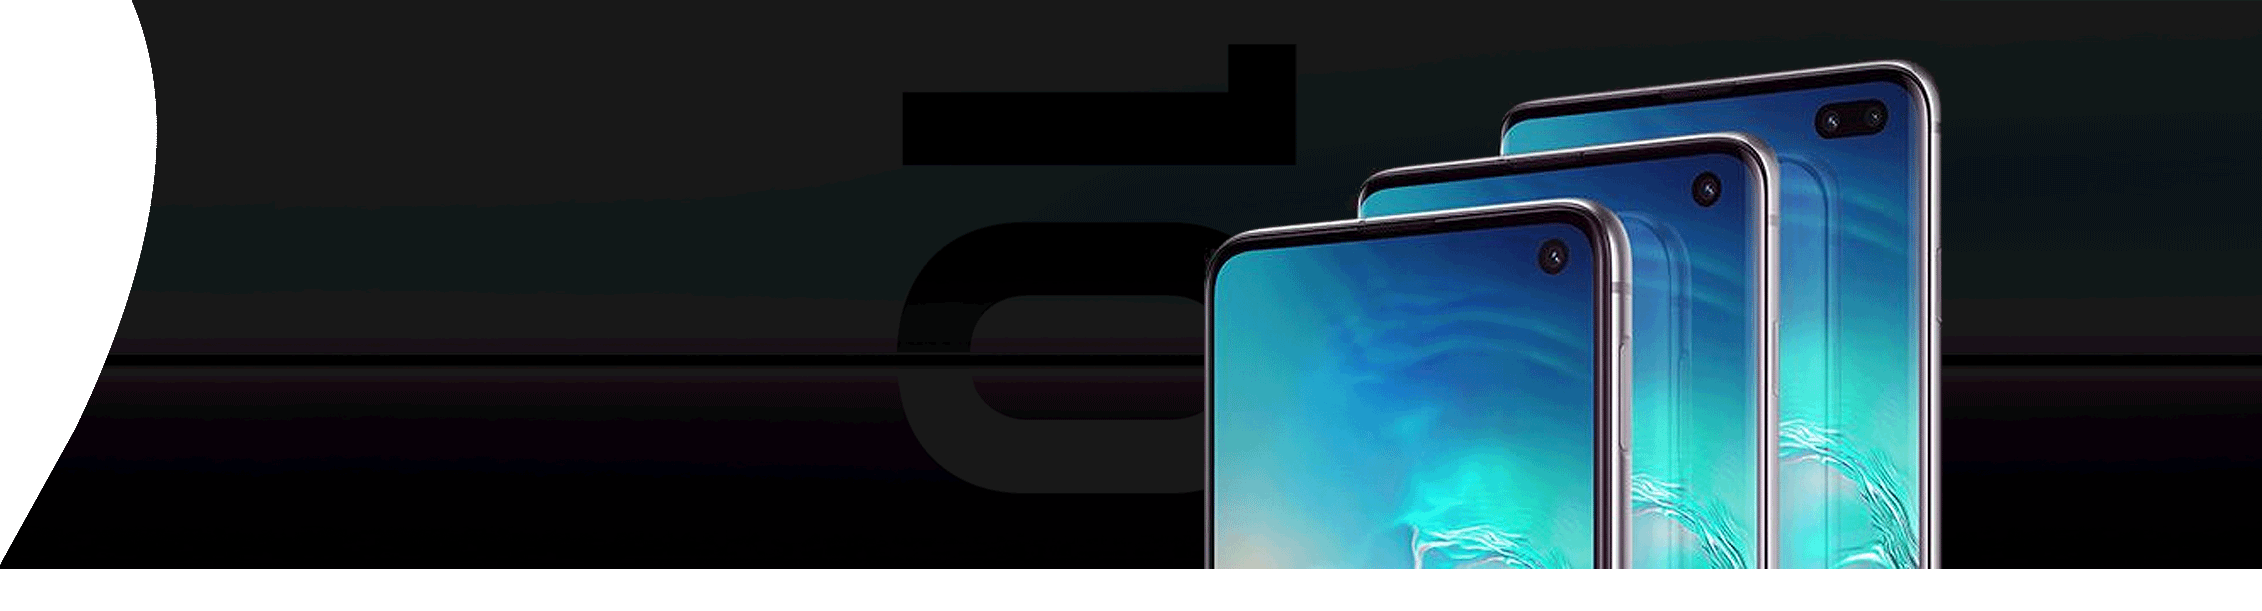 NEW Samsung Galaxy S10 range